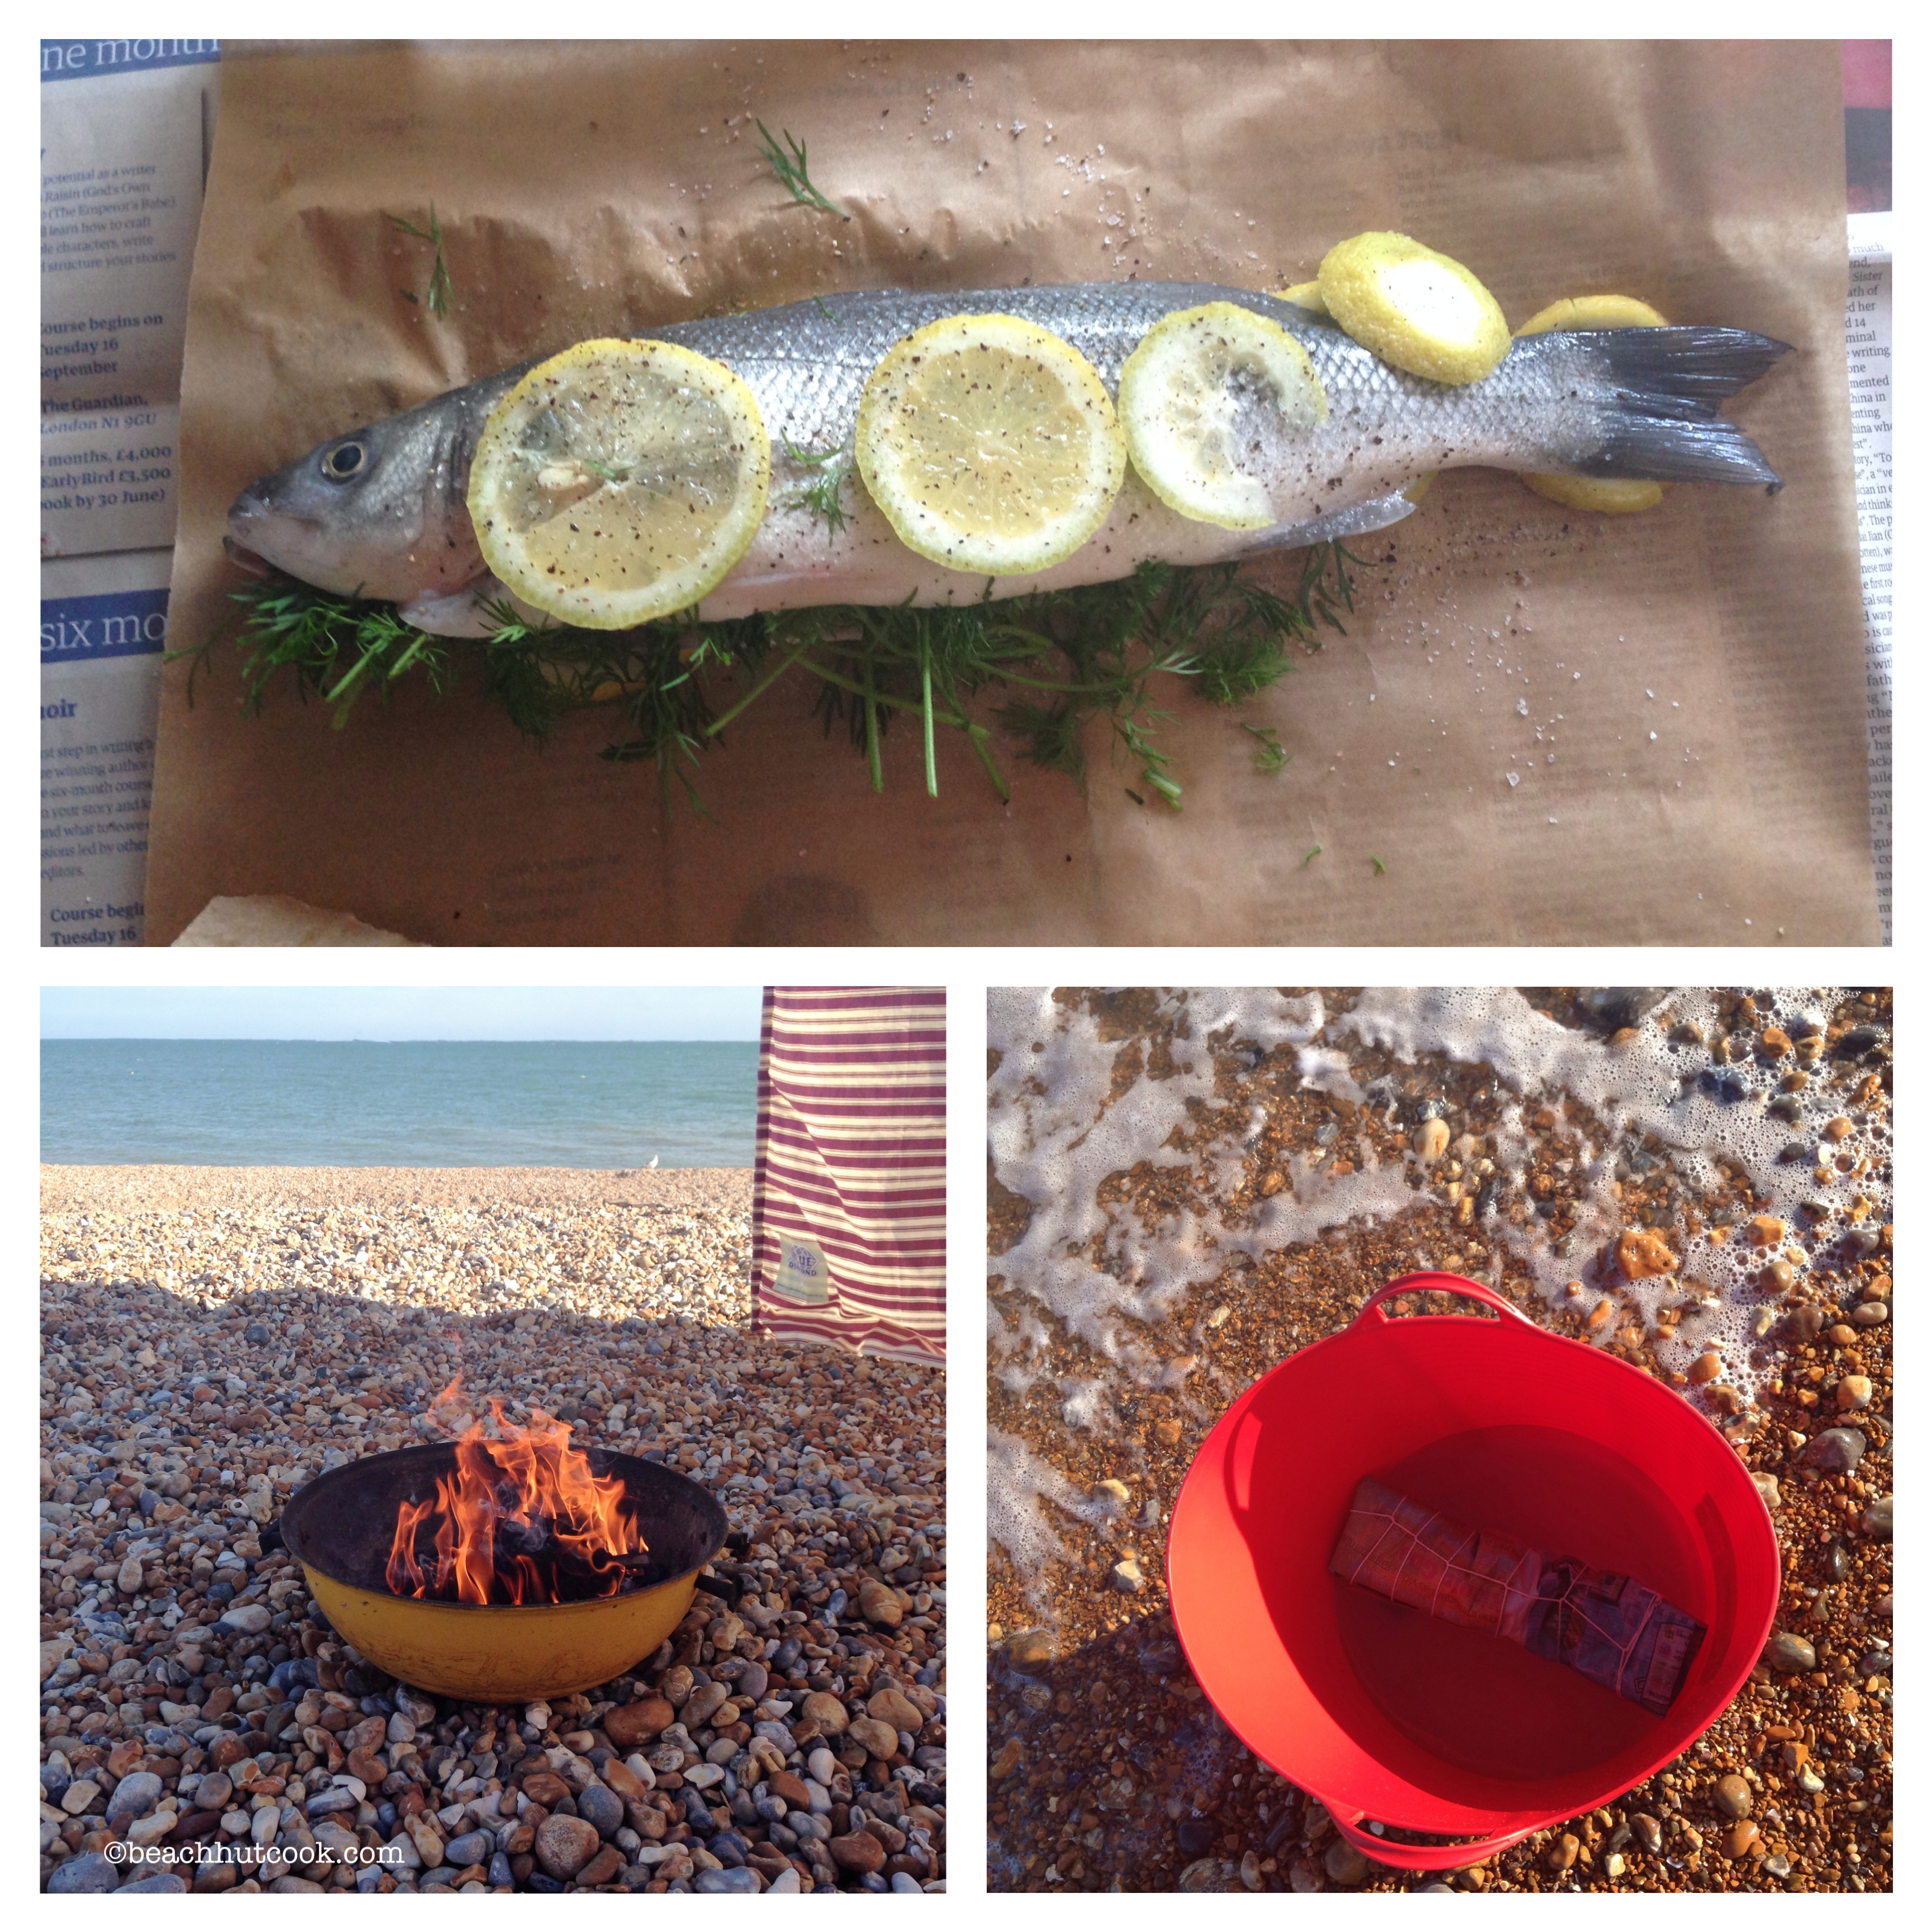 Beachhutcook Cooking Fish in Newspaper on the Beach